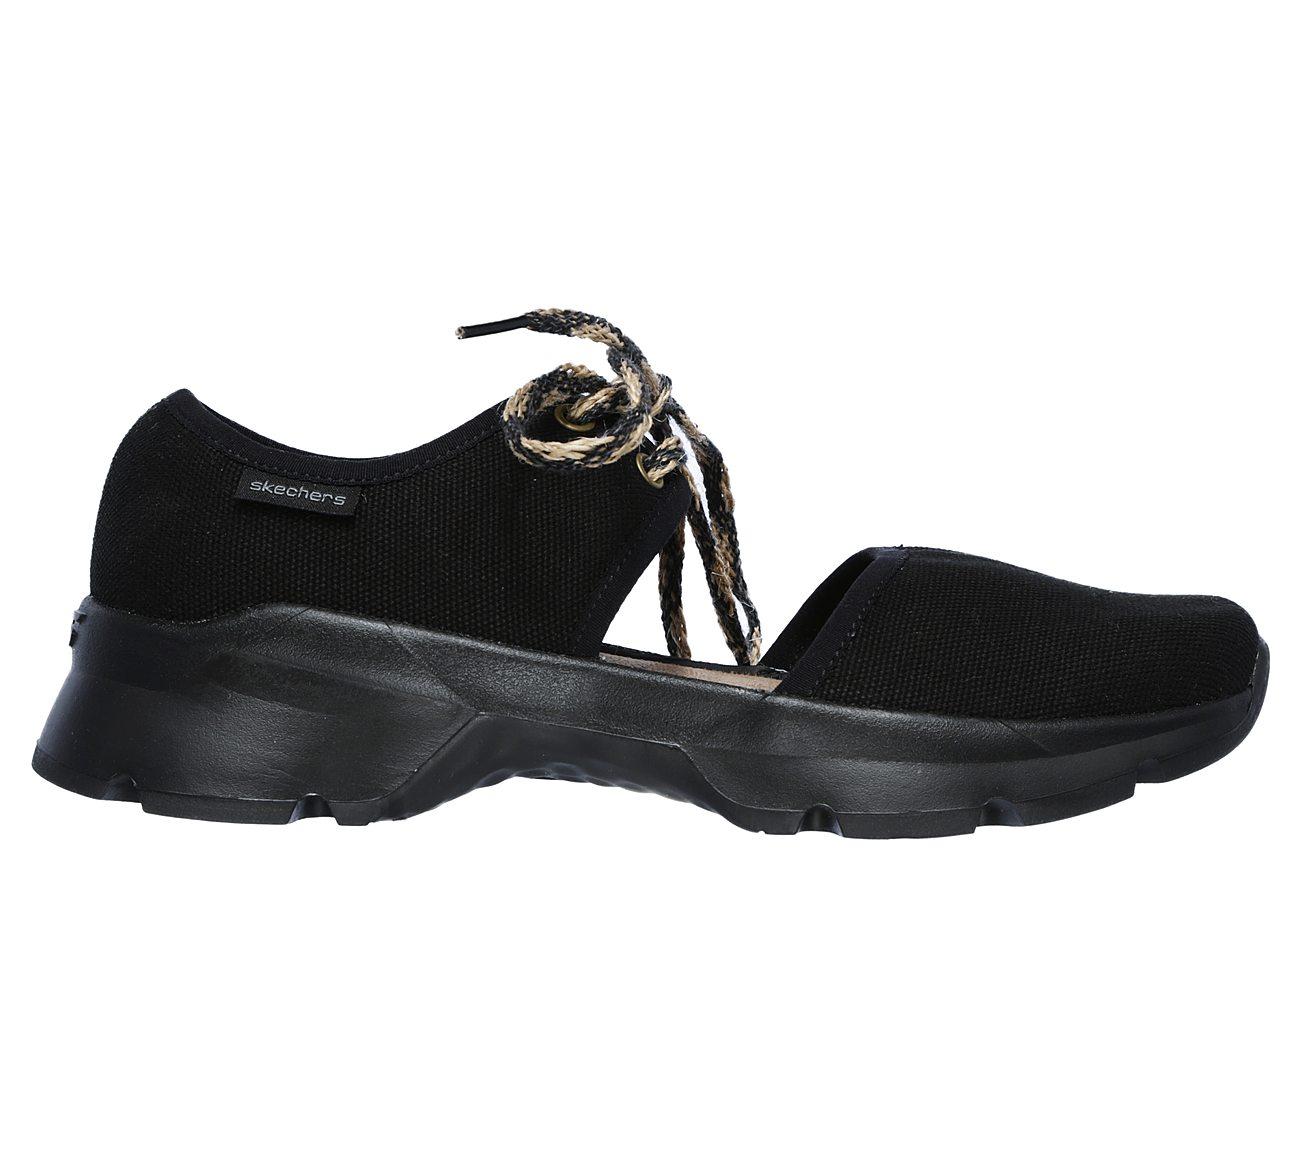 447aa7d418 Buy SKECHERS Skechers ONE Bora - Peachy Keen Skechers ONE Shoes only ...